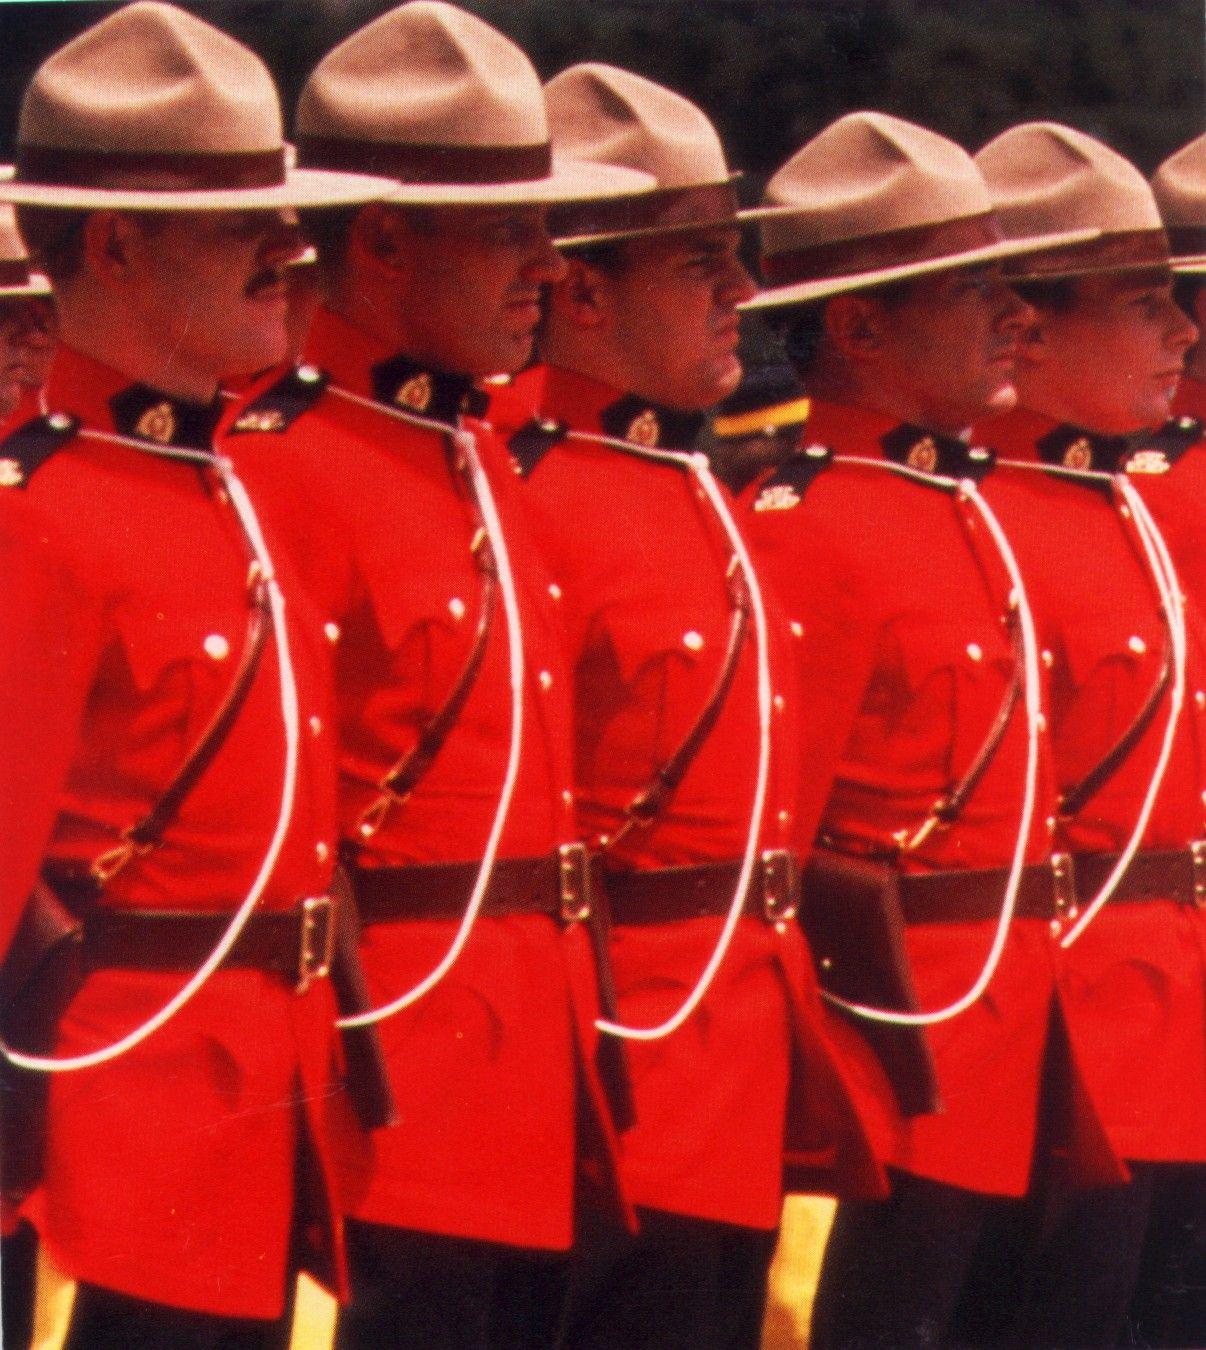 Attorney General Seeks To Halt Mountie S Human Rights